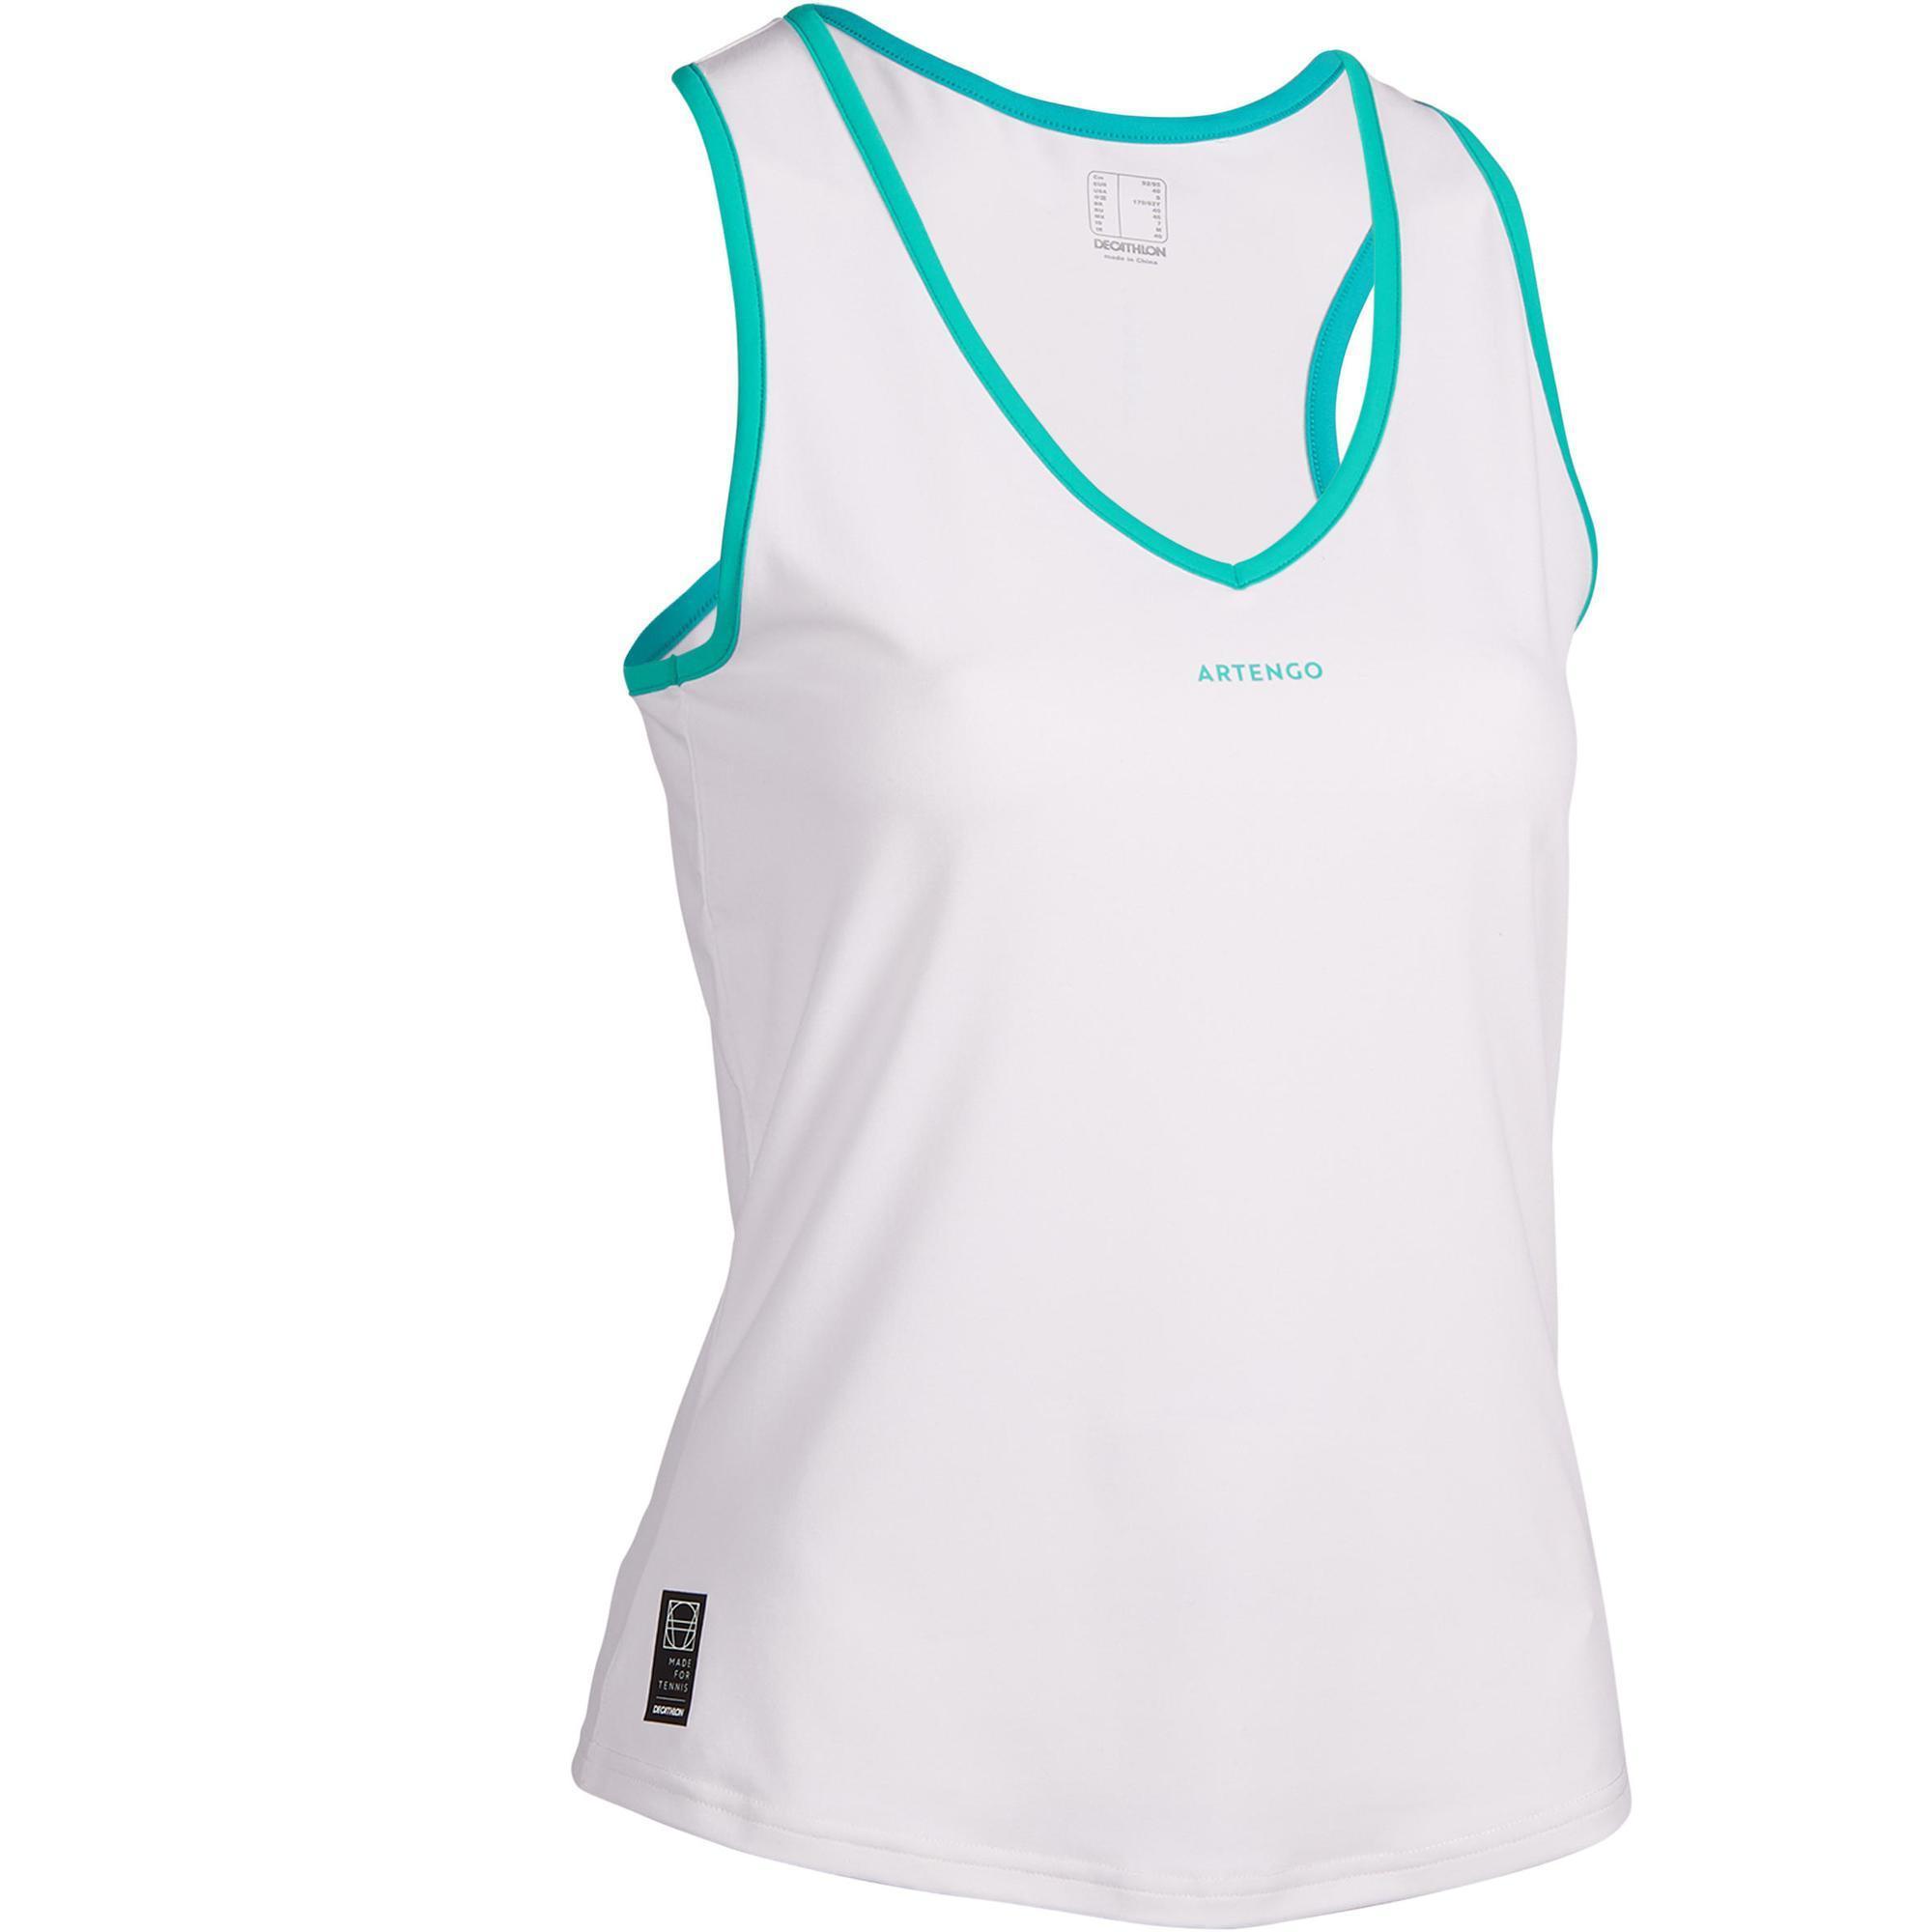 Tennis-Top TK Light 900 Damen weiß   Sportbekleidung > Sporttops > Tennistops   Artengo